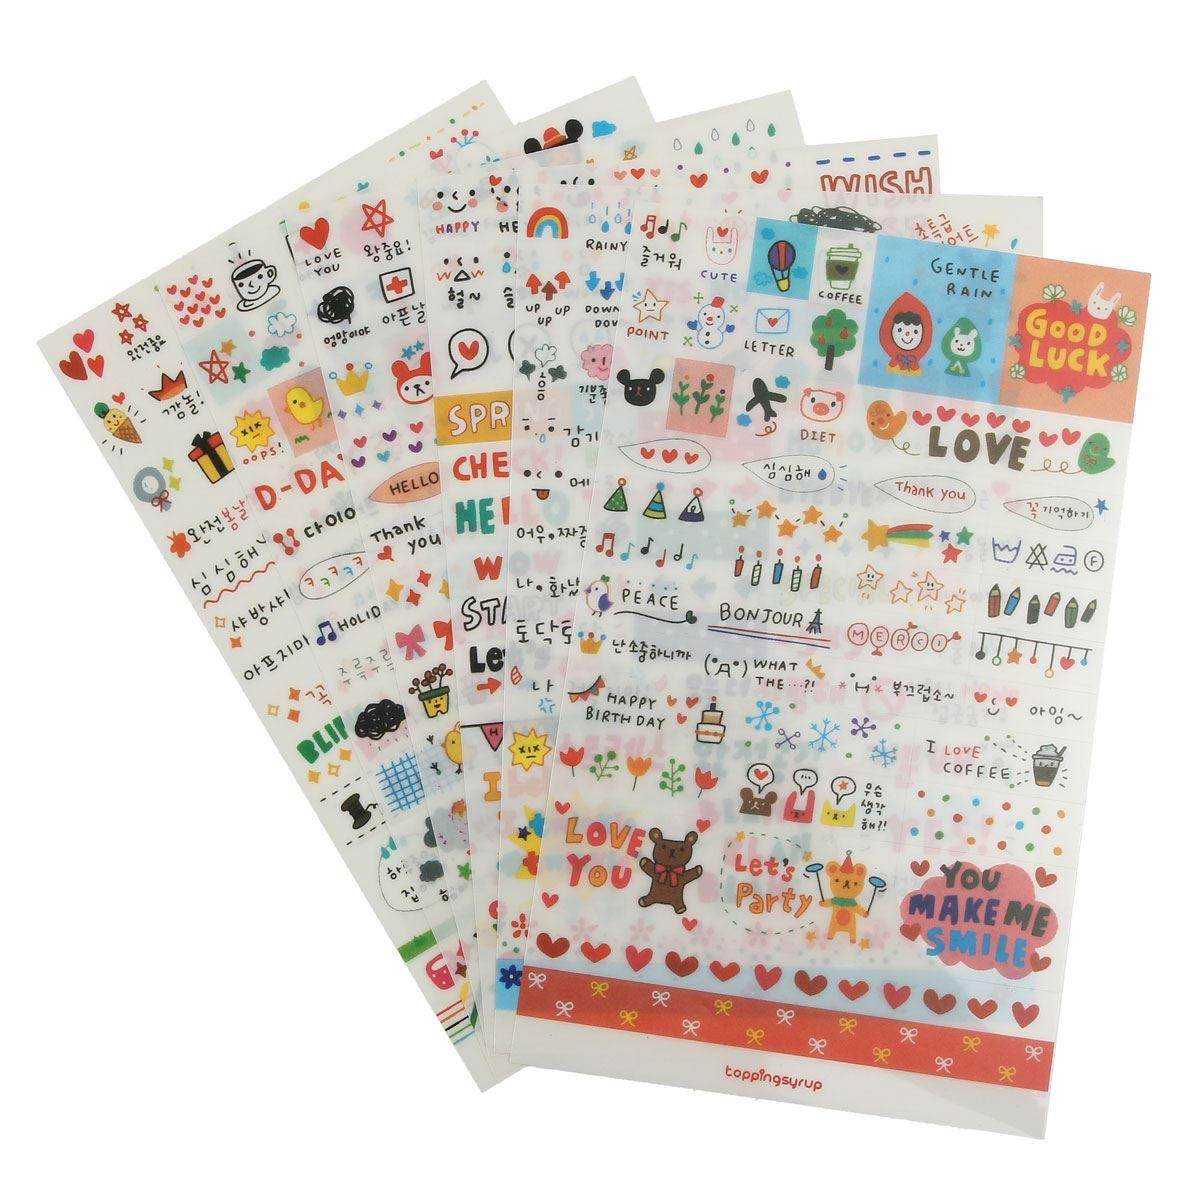 Scrapbook paper books - Aliexpress Com Buy 6 Sheets Pack Cute Diy Word Expression Diary Album Diy Scrapbooking Paper Sticker Book Calendar Card Scrapbooking From Reliable